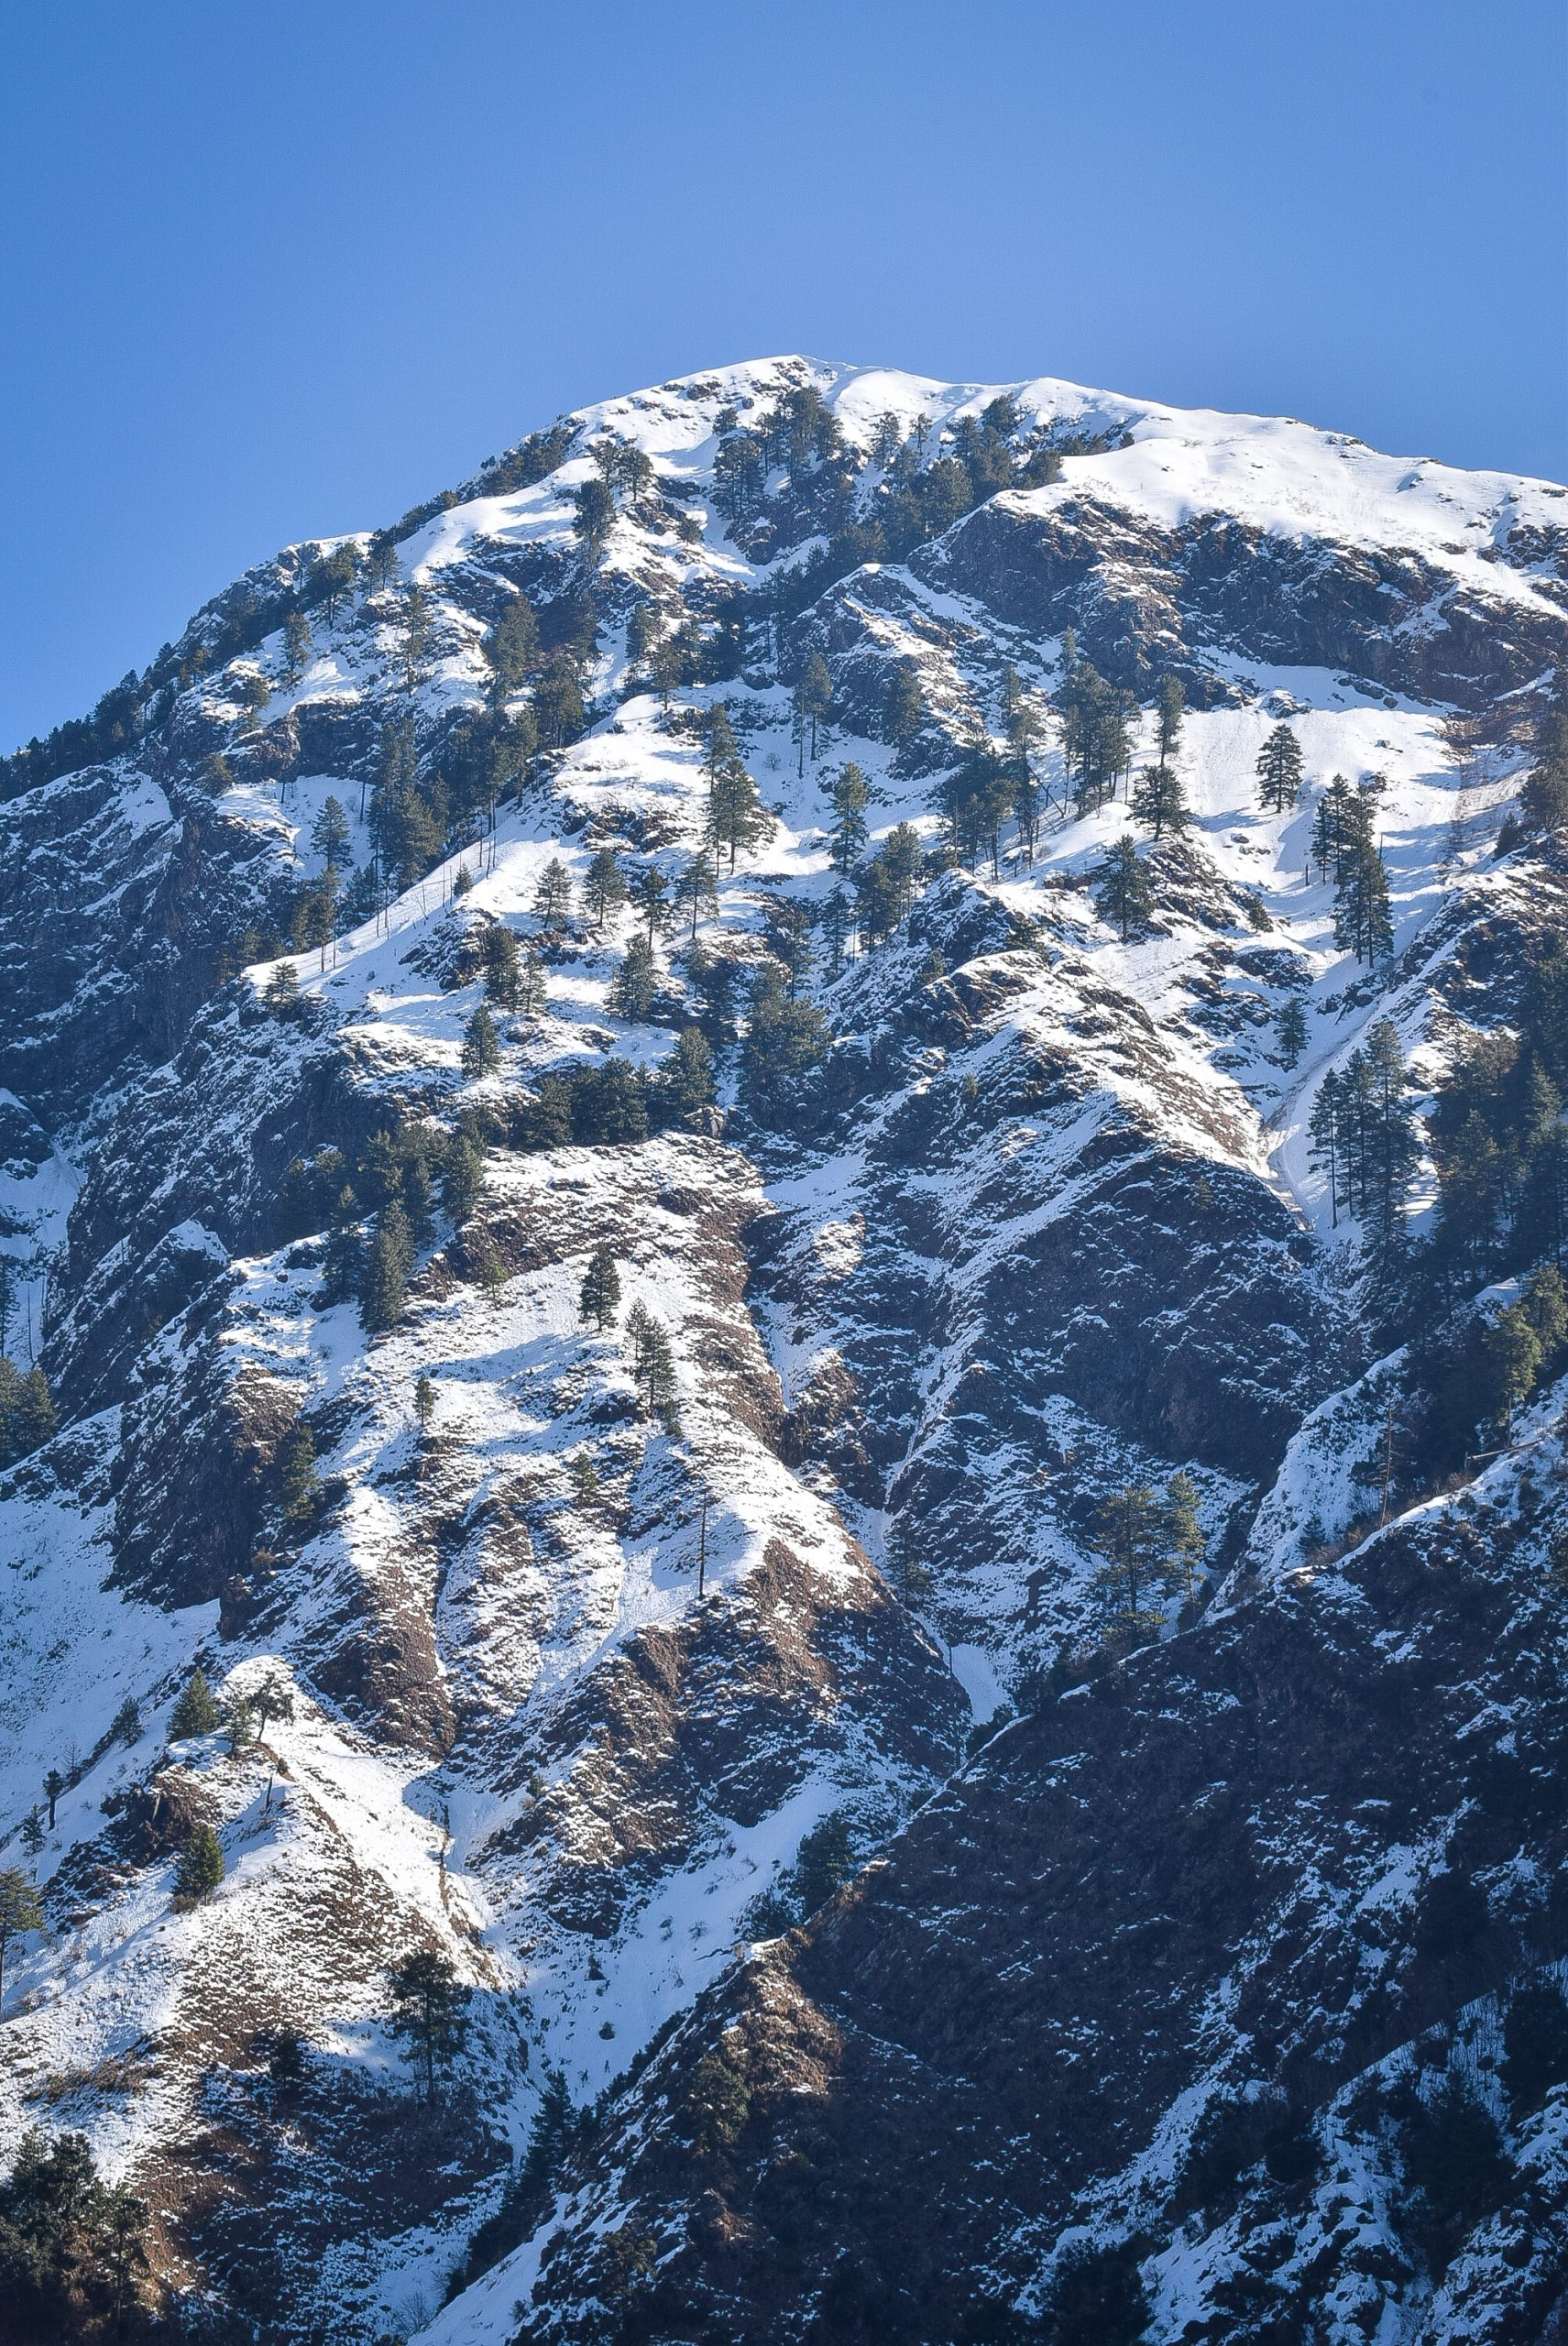 Snowy mountains near Vaishno Mata temple